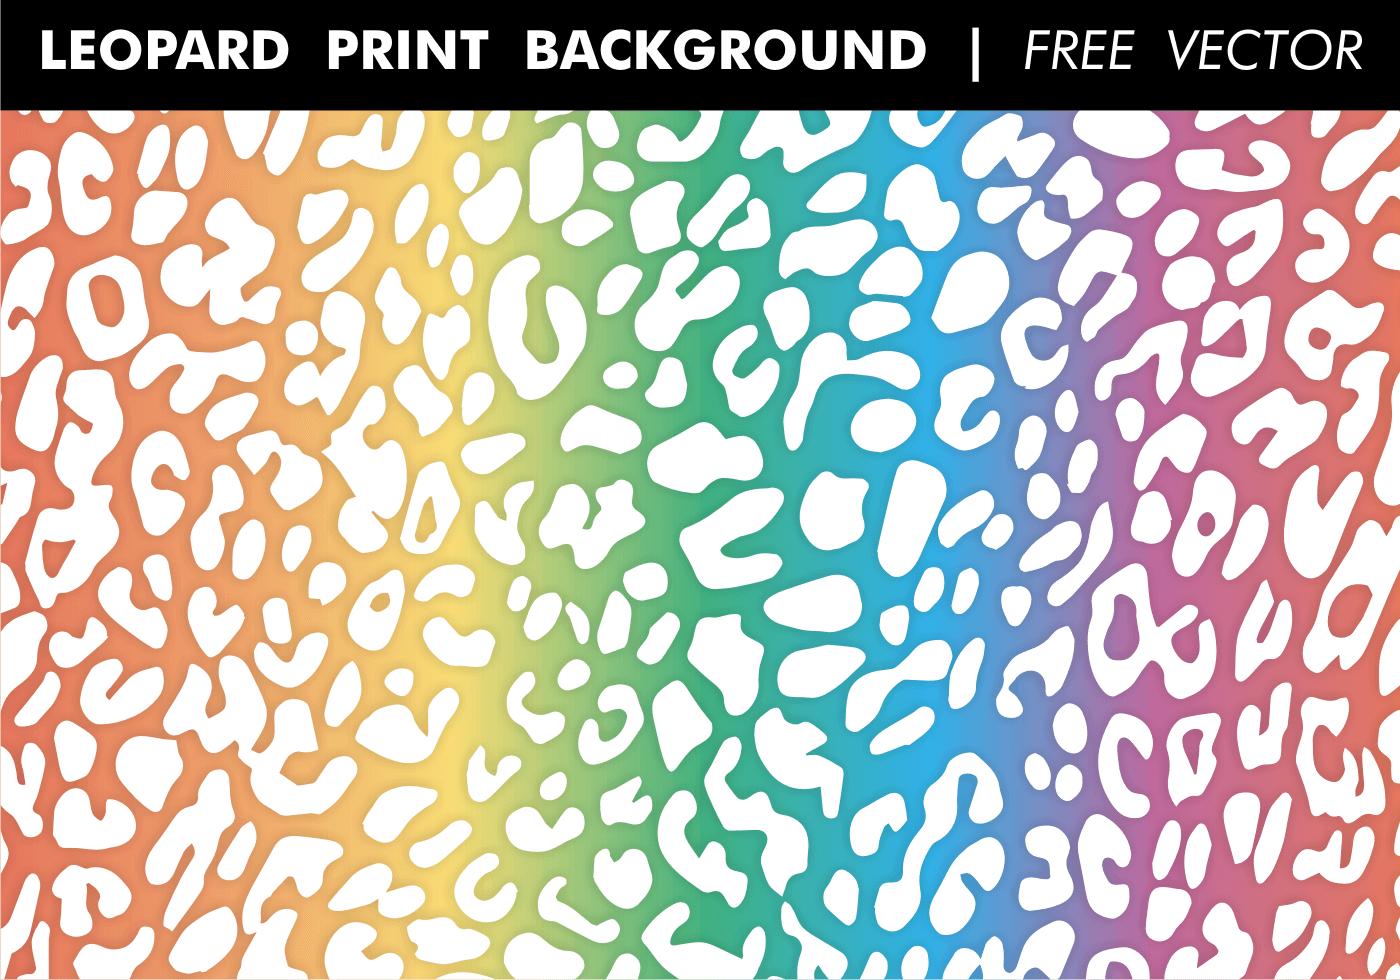 Download Leopard Print Background - Download Free Vectors, Clipart ...